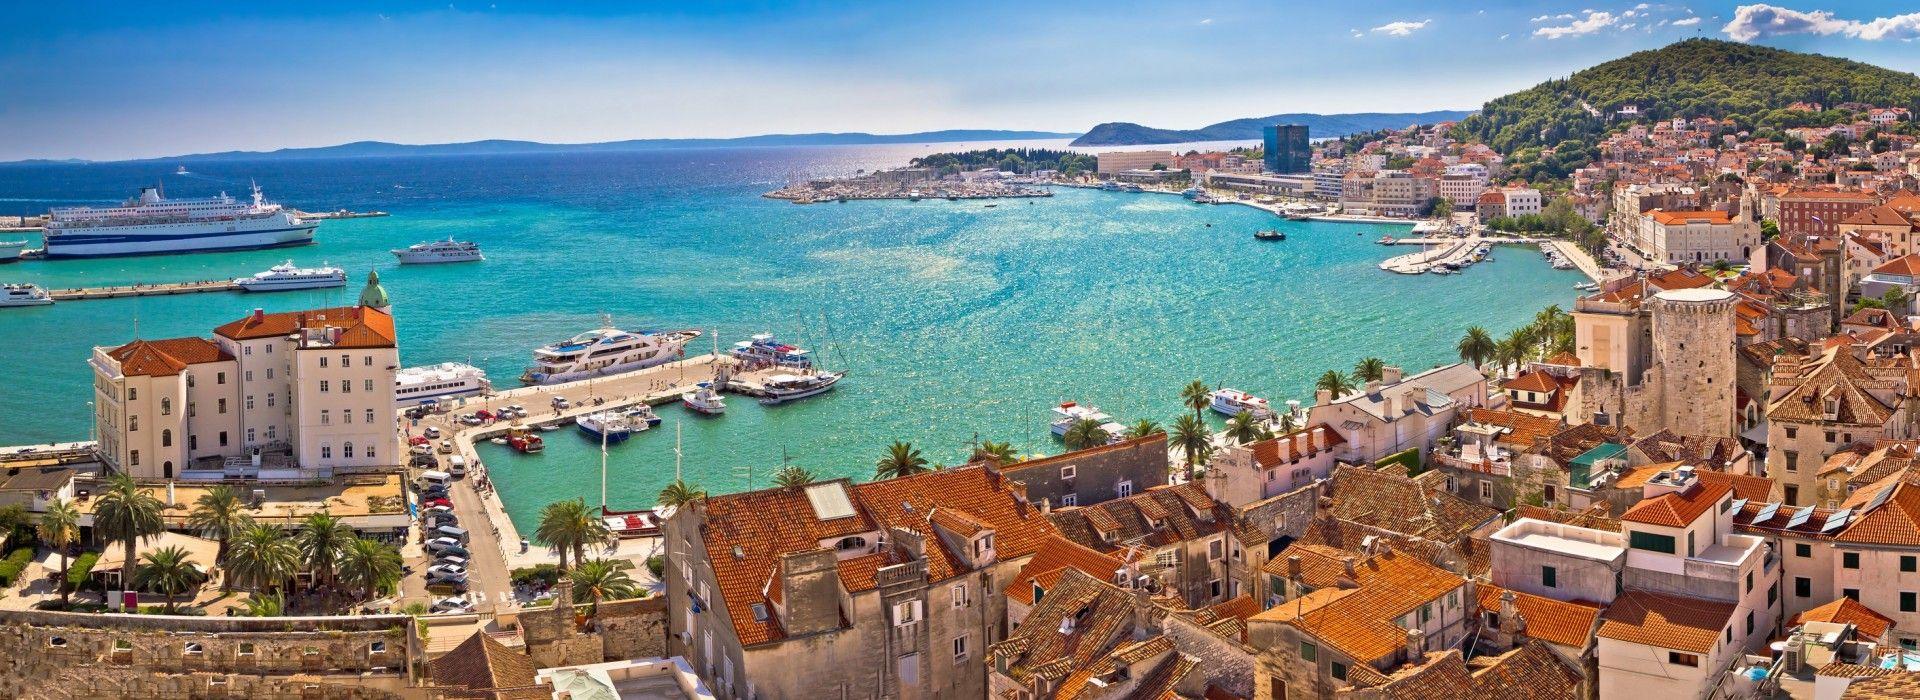 Sightseeing Tours in Balkans